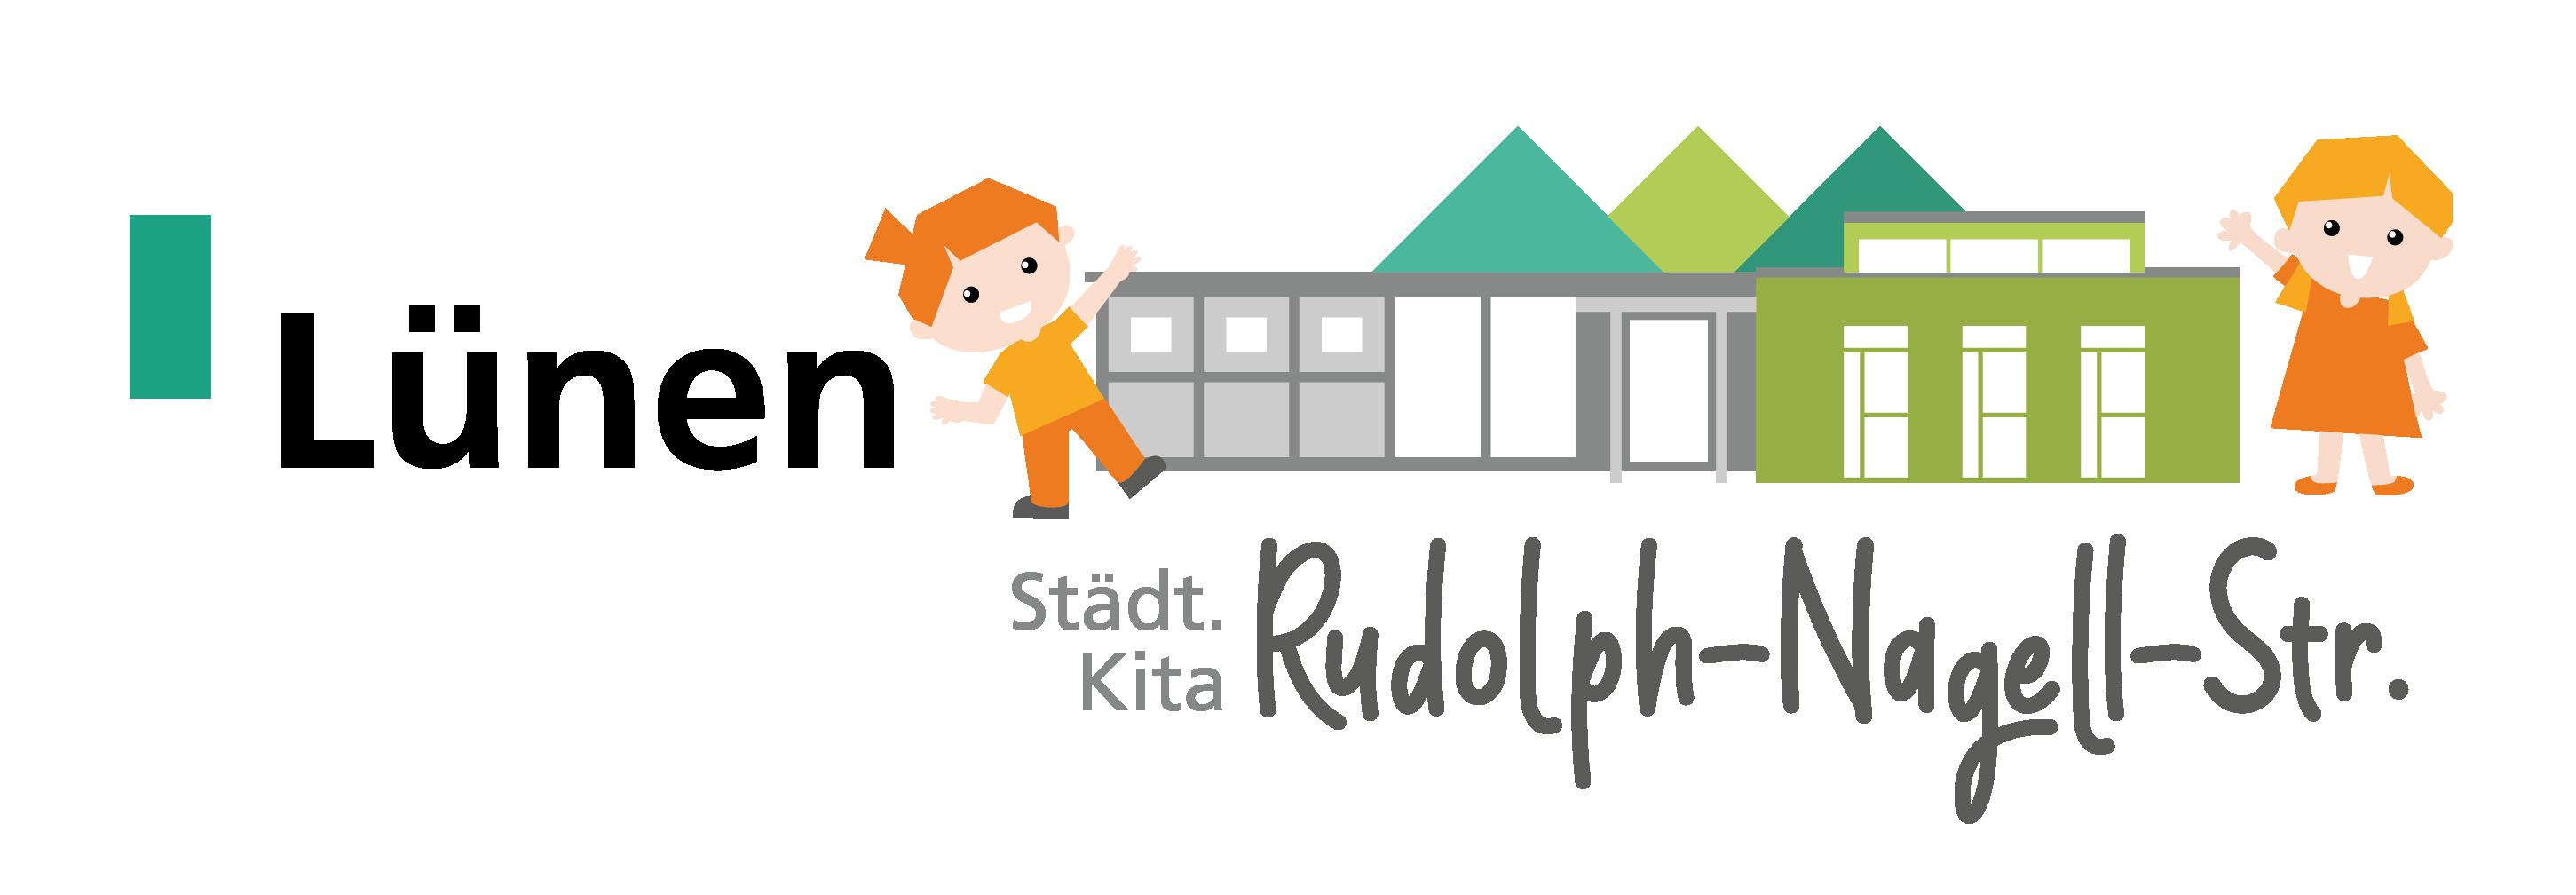 Logo Rudolph-Nagell